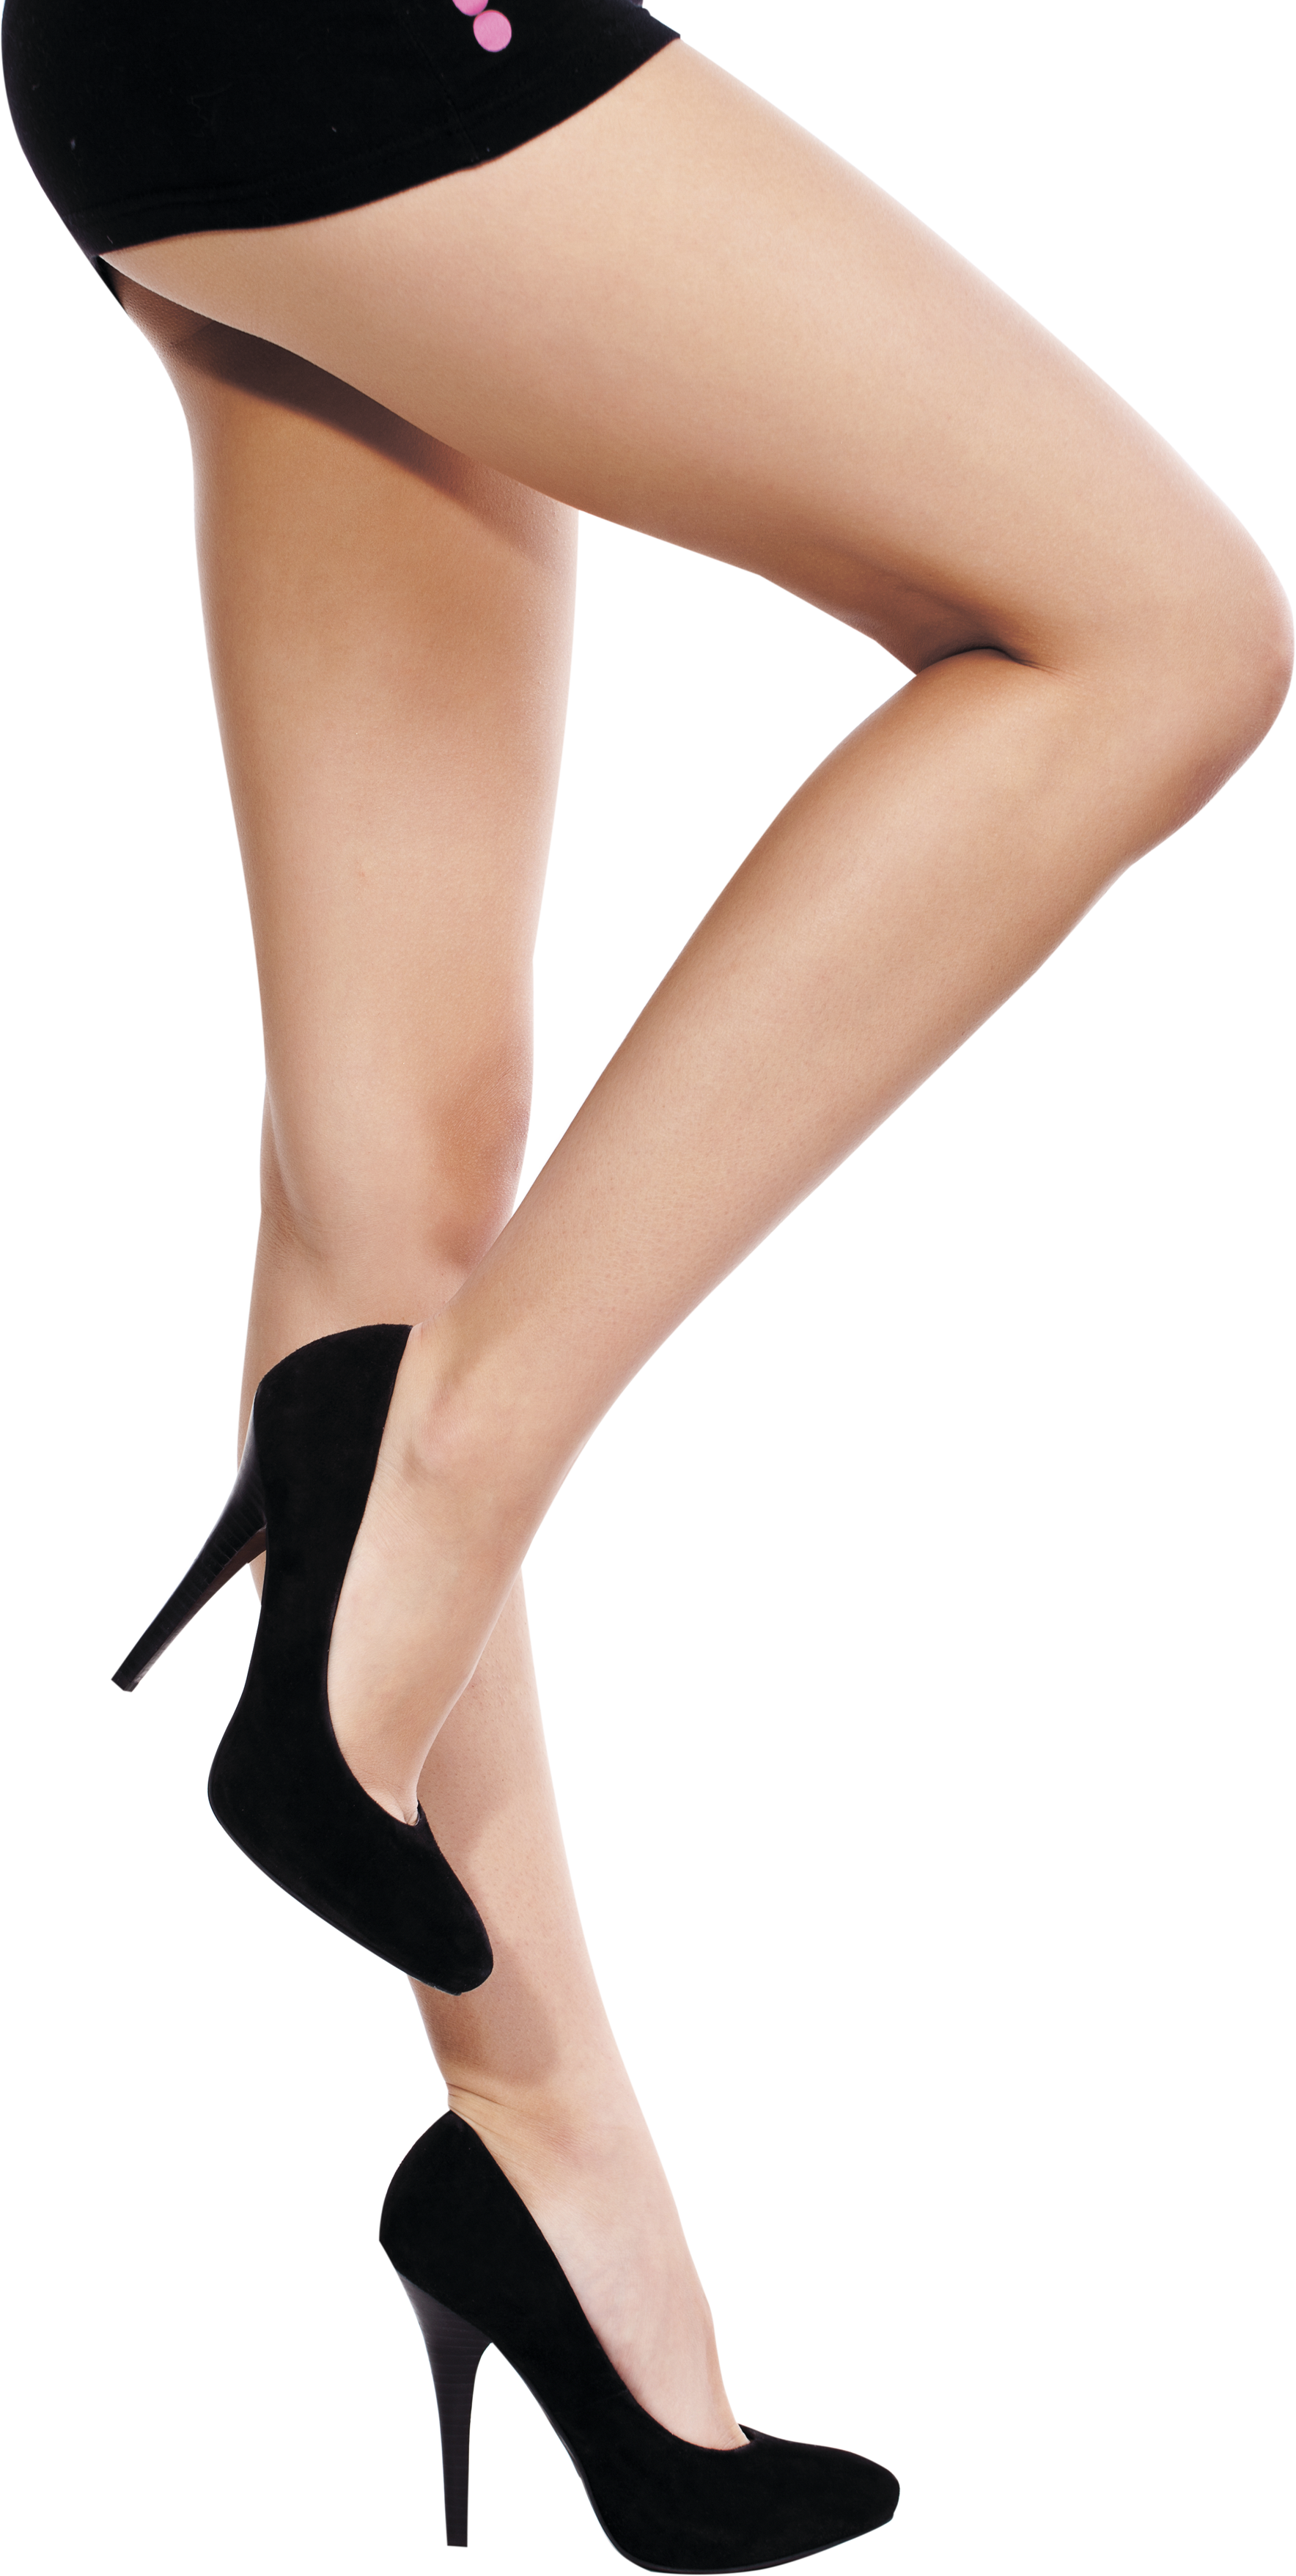 Women legs PNG image - Legs PNG